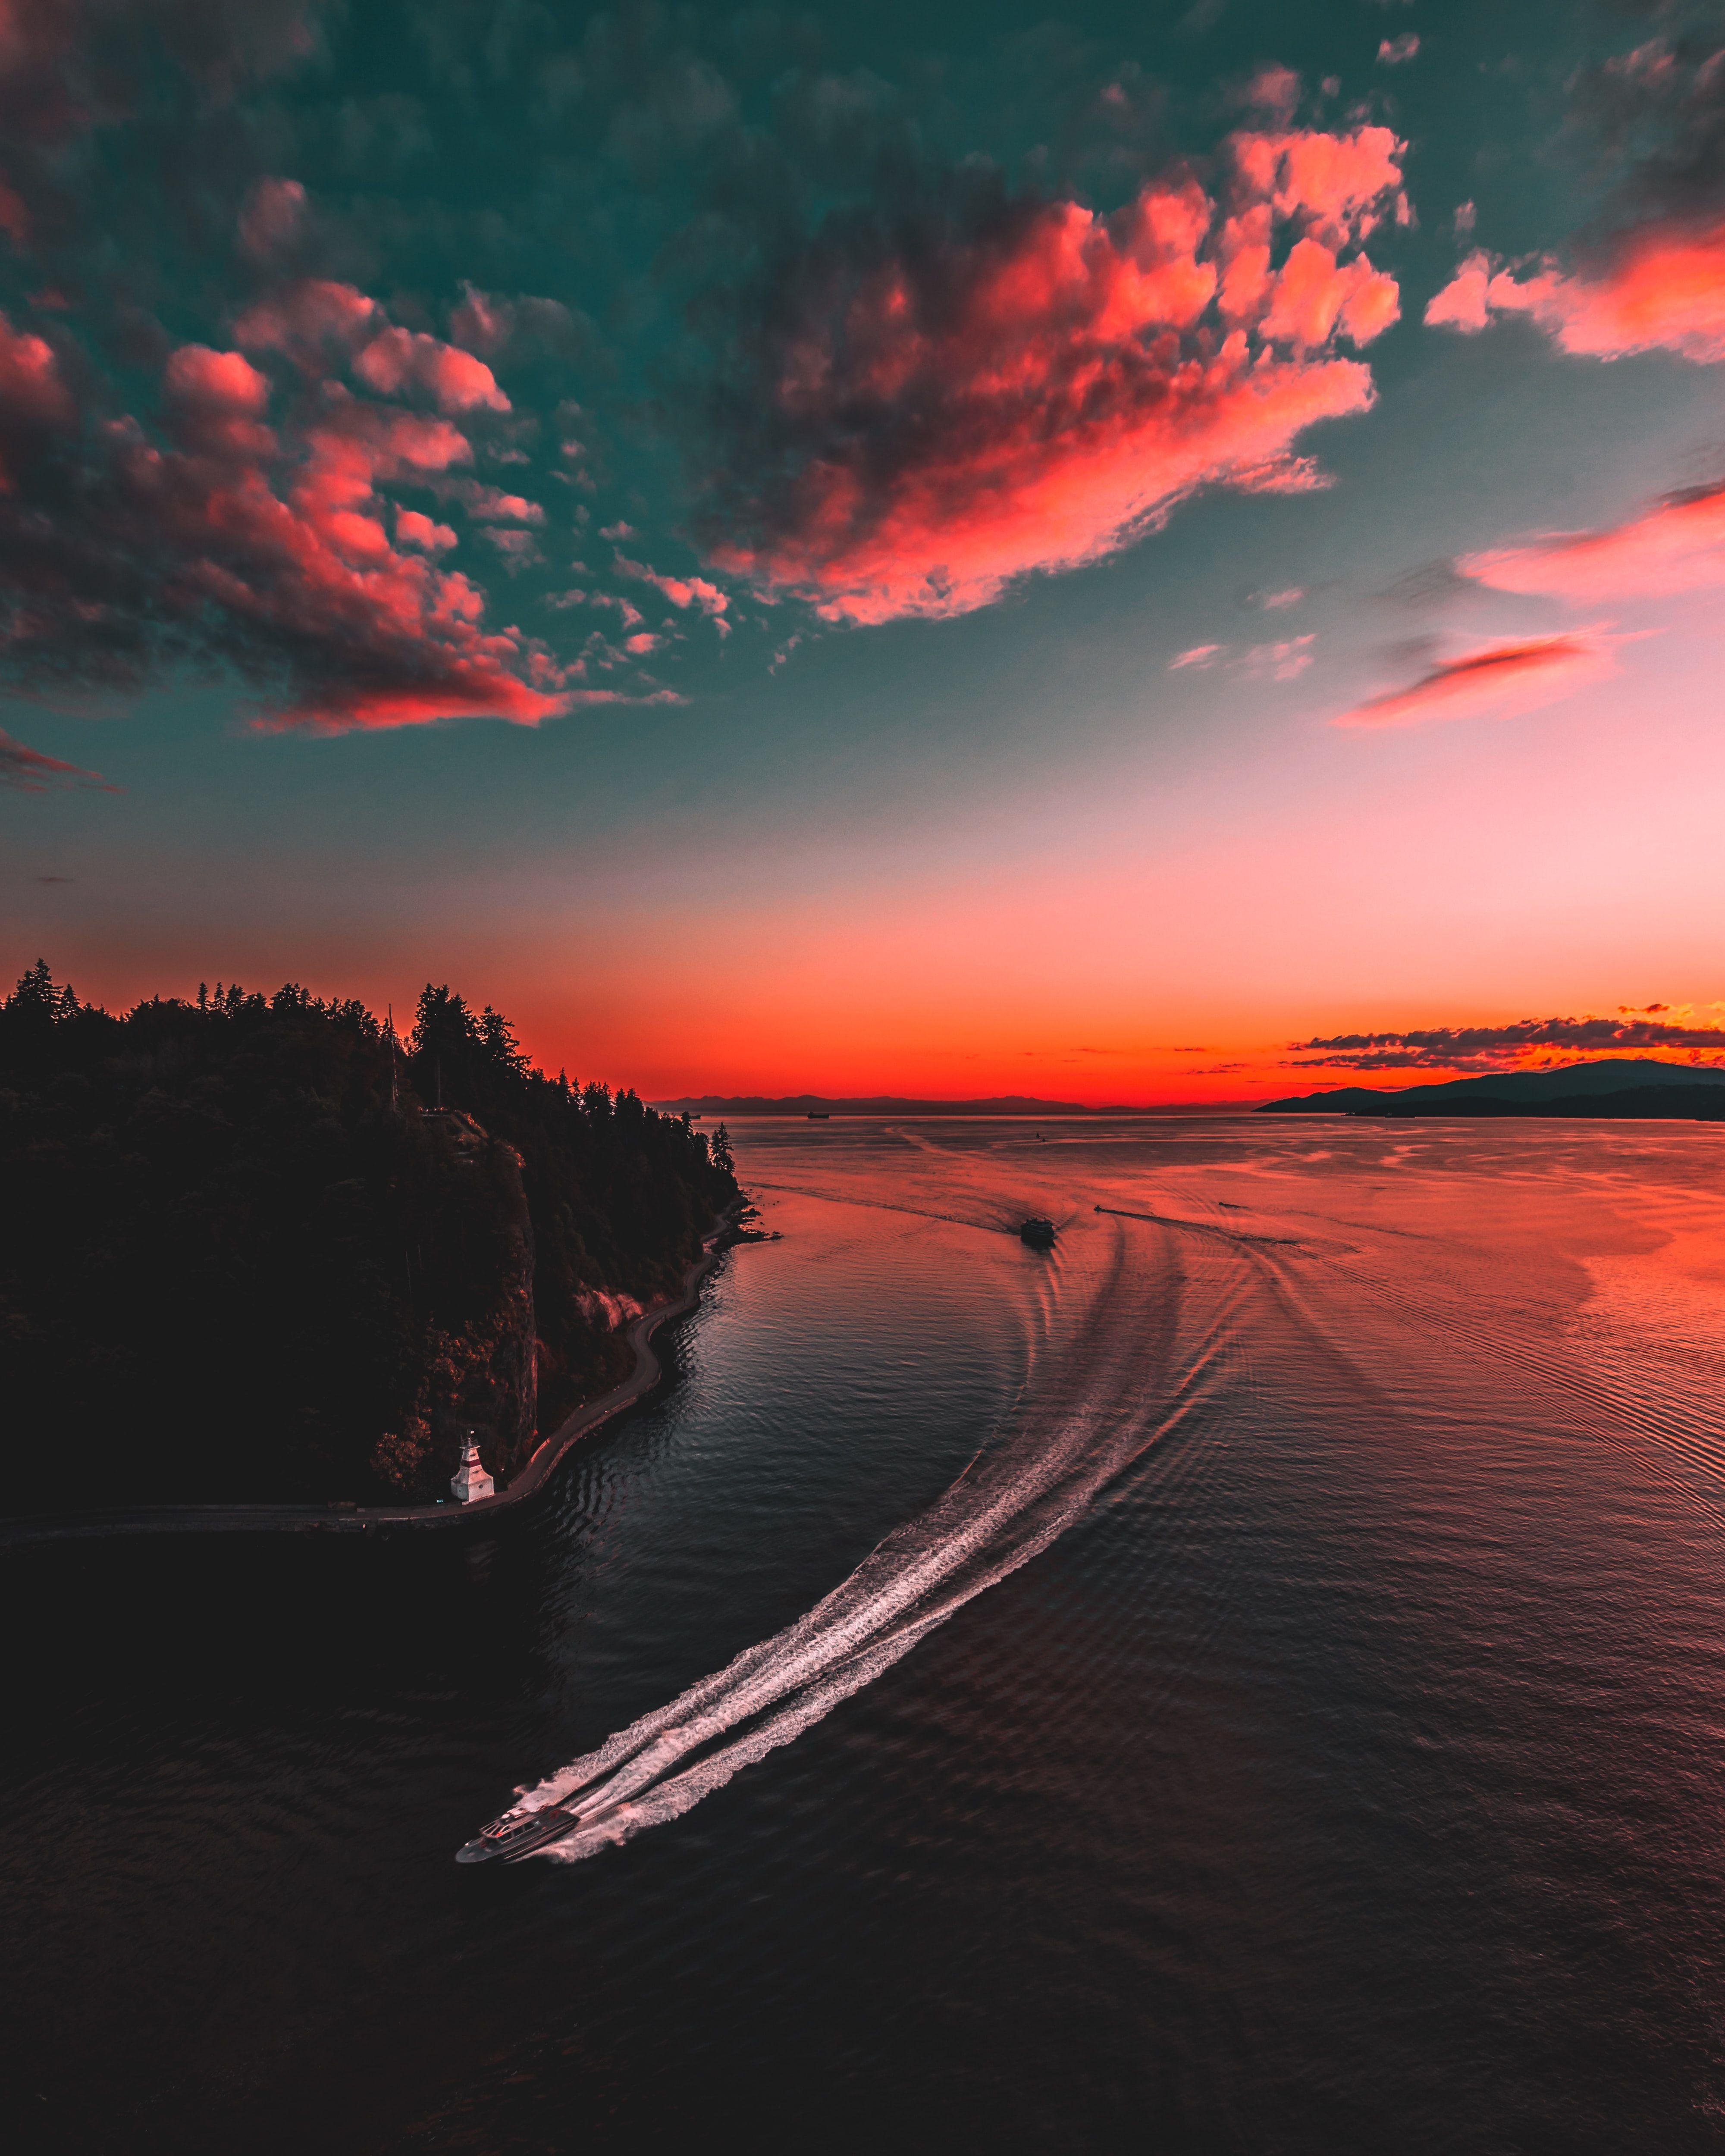 sunset aesthetic 4k wallpapers